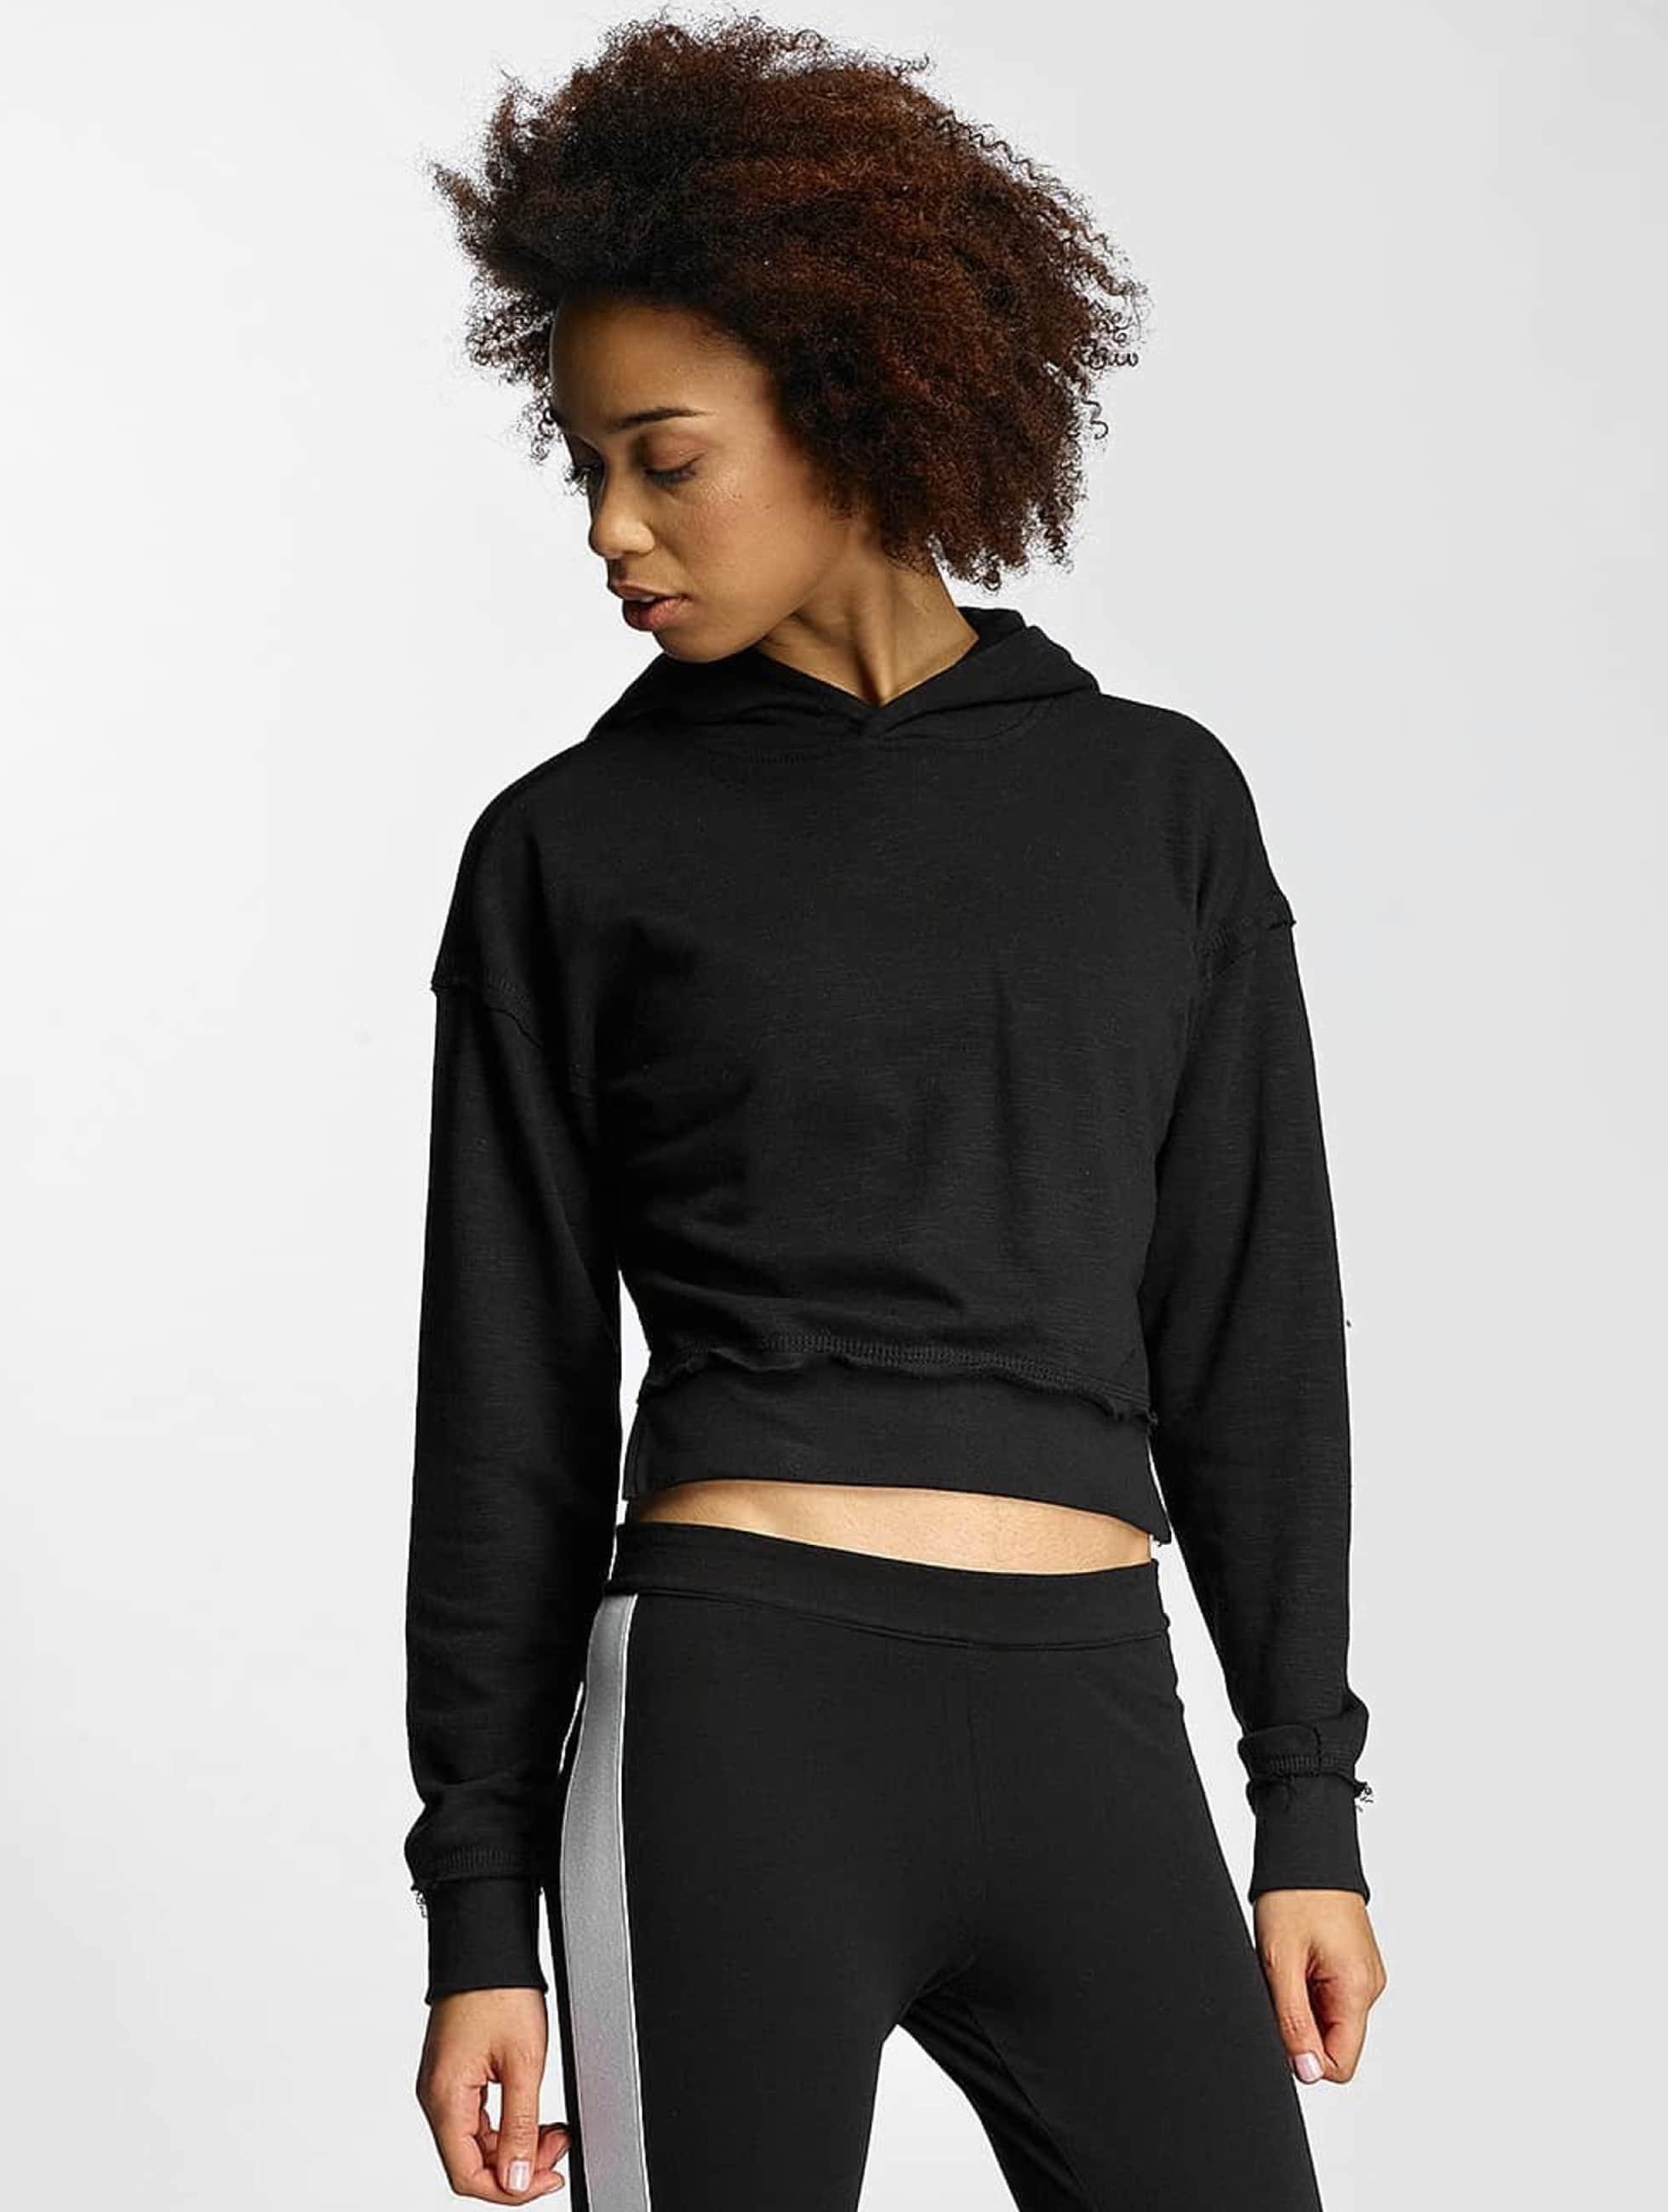 Urban Classics Frauen Hoody Ladies Slub Terry in schwarz